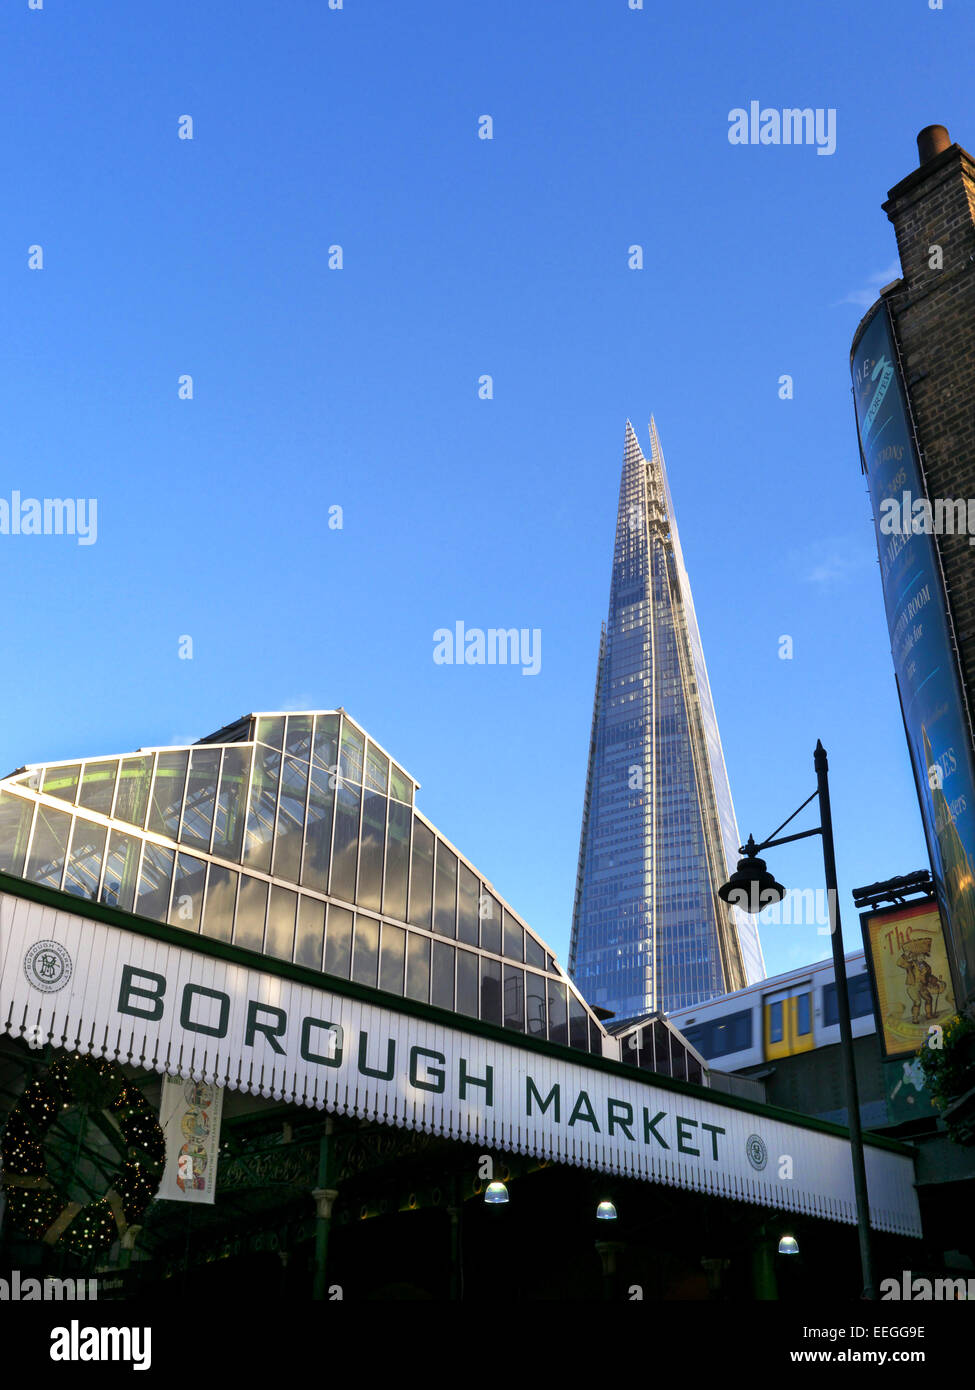 Borough Market a renowned popular international produce retail market with 'The Shard' behind London Bridge - Stock Image